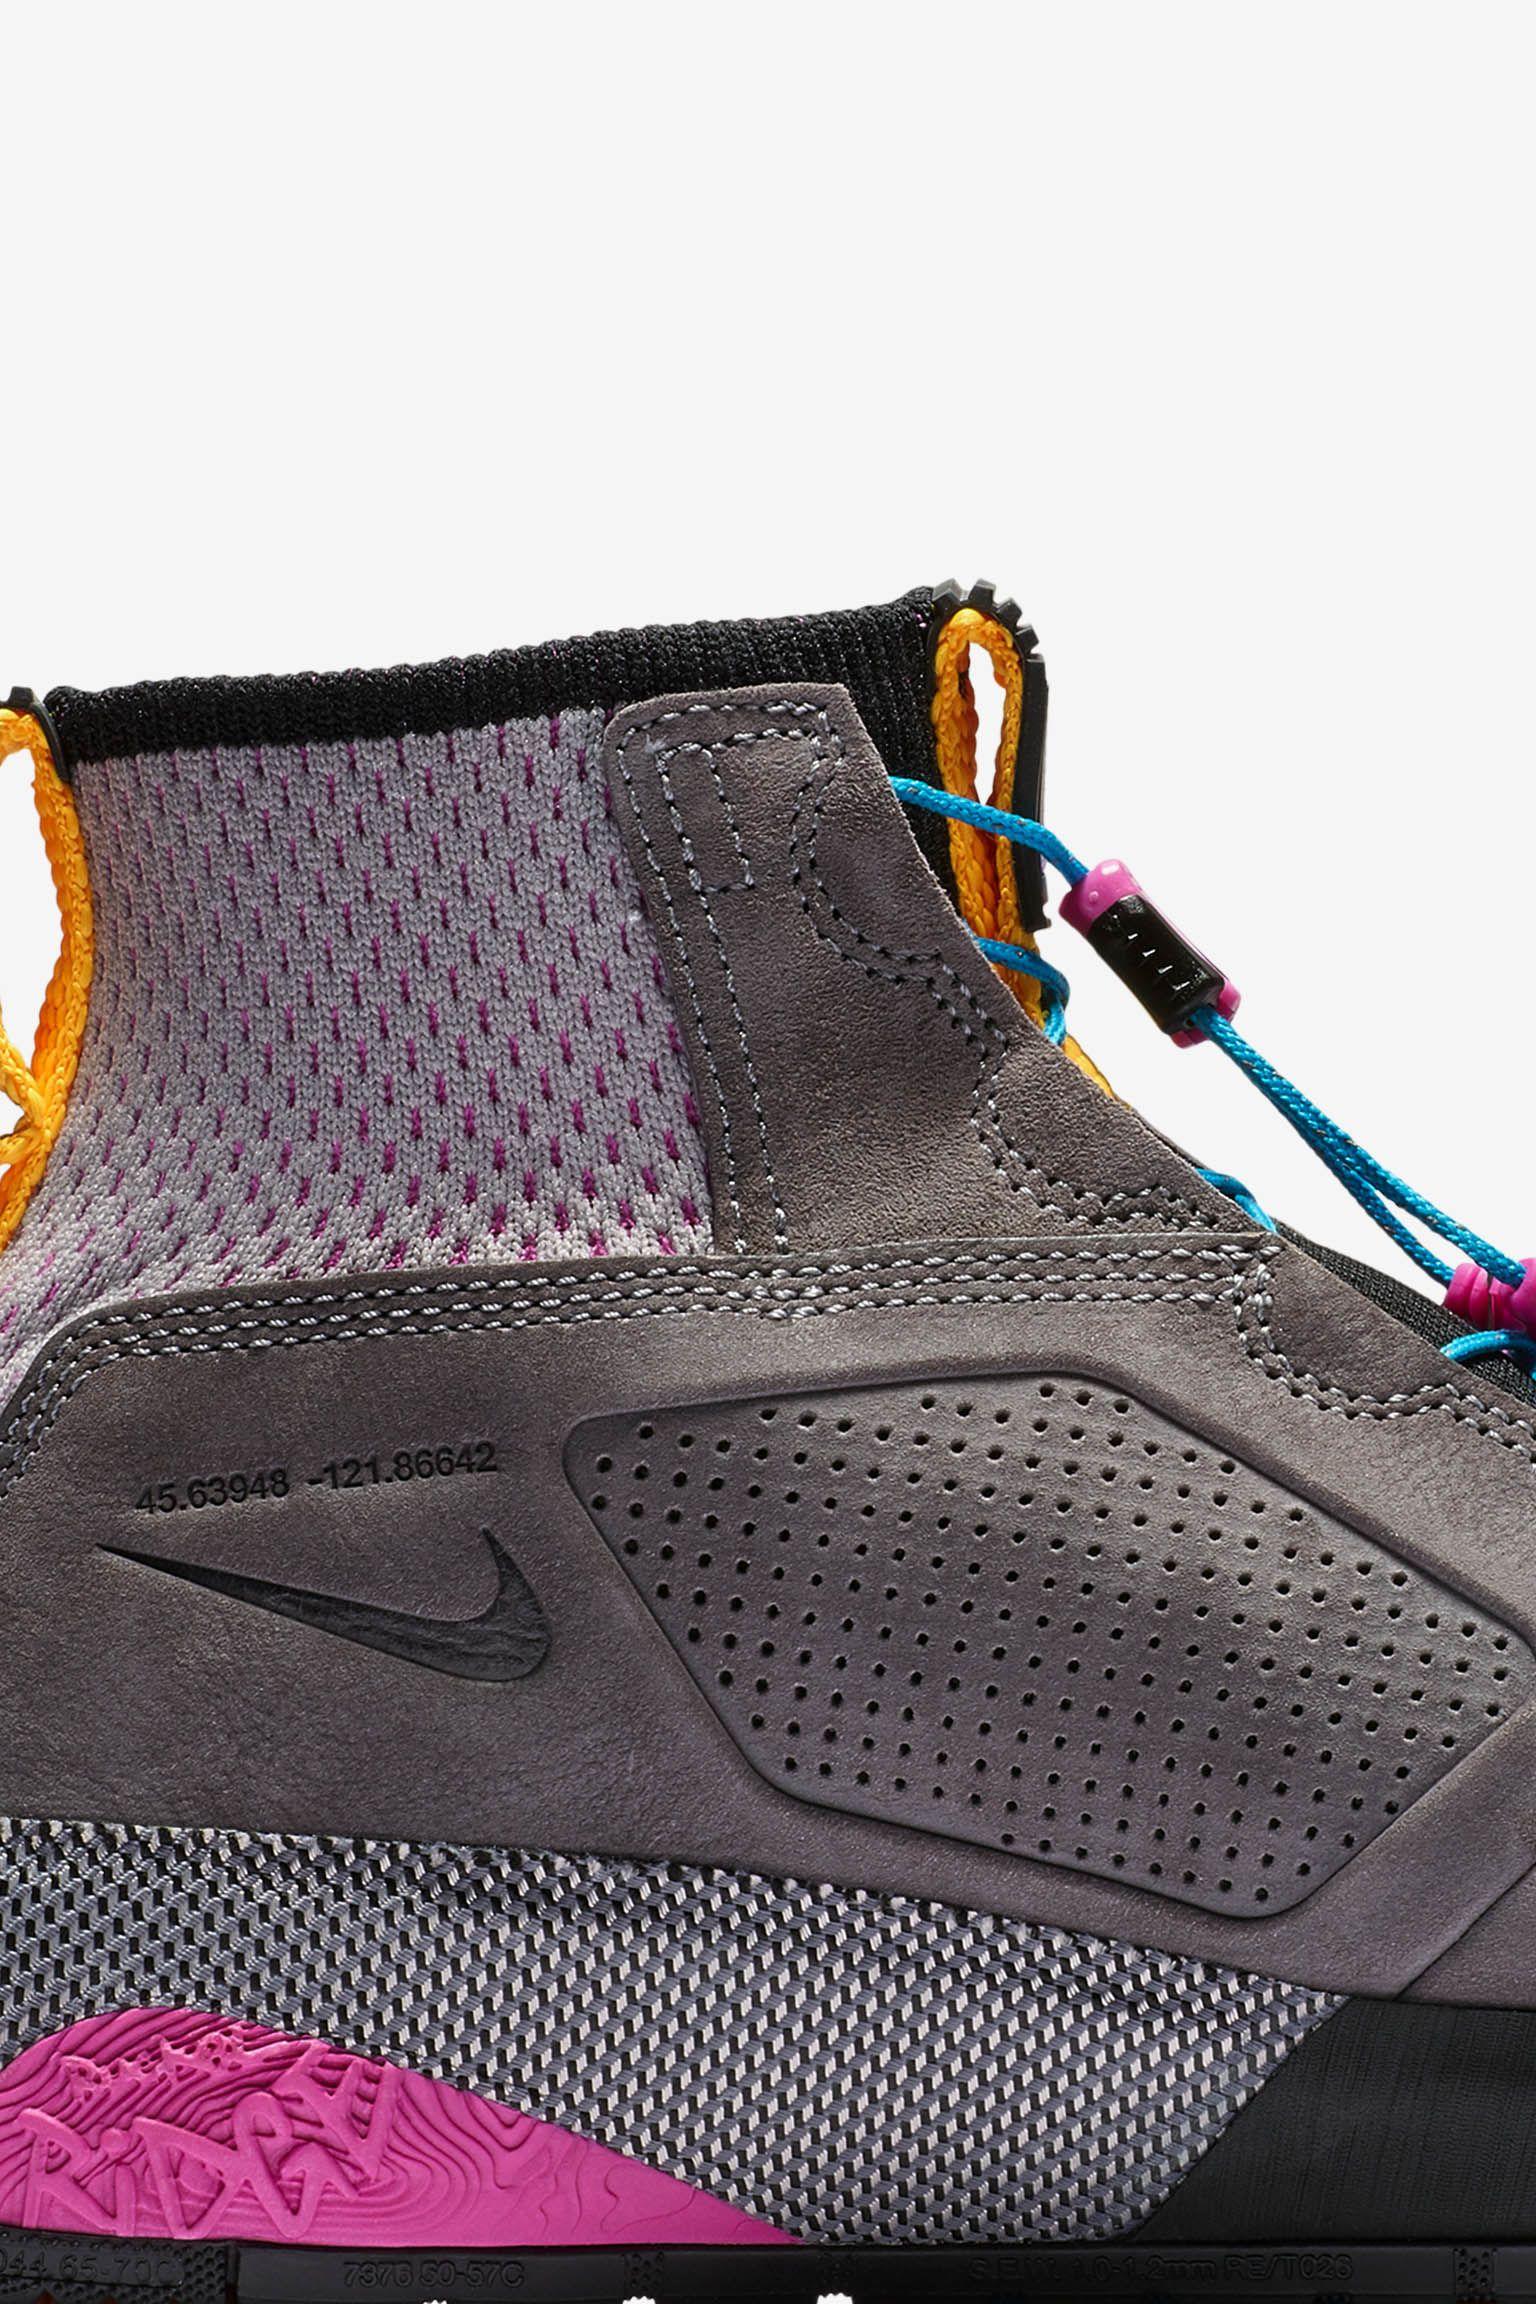 Nike ACG Ruckel Ridge 'Gunsmoke & Atmosphere Grey' Release Date